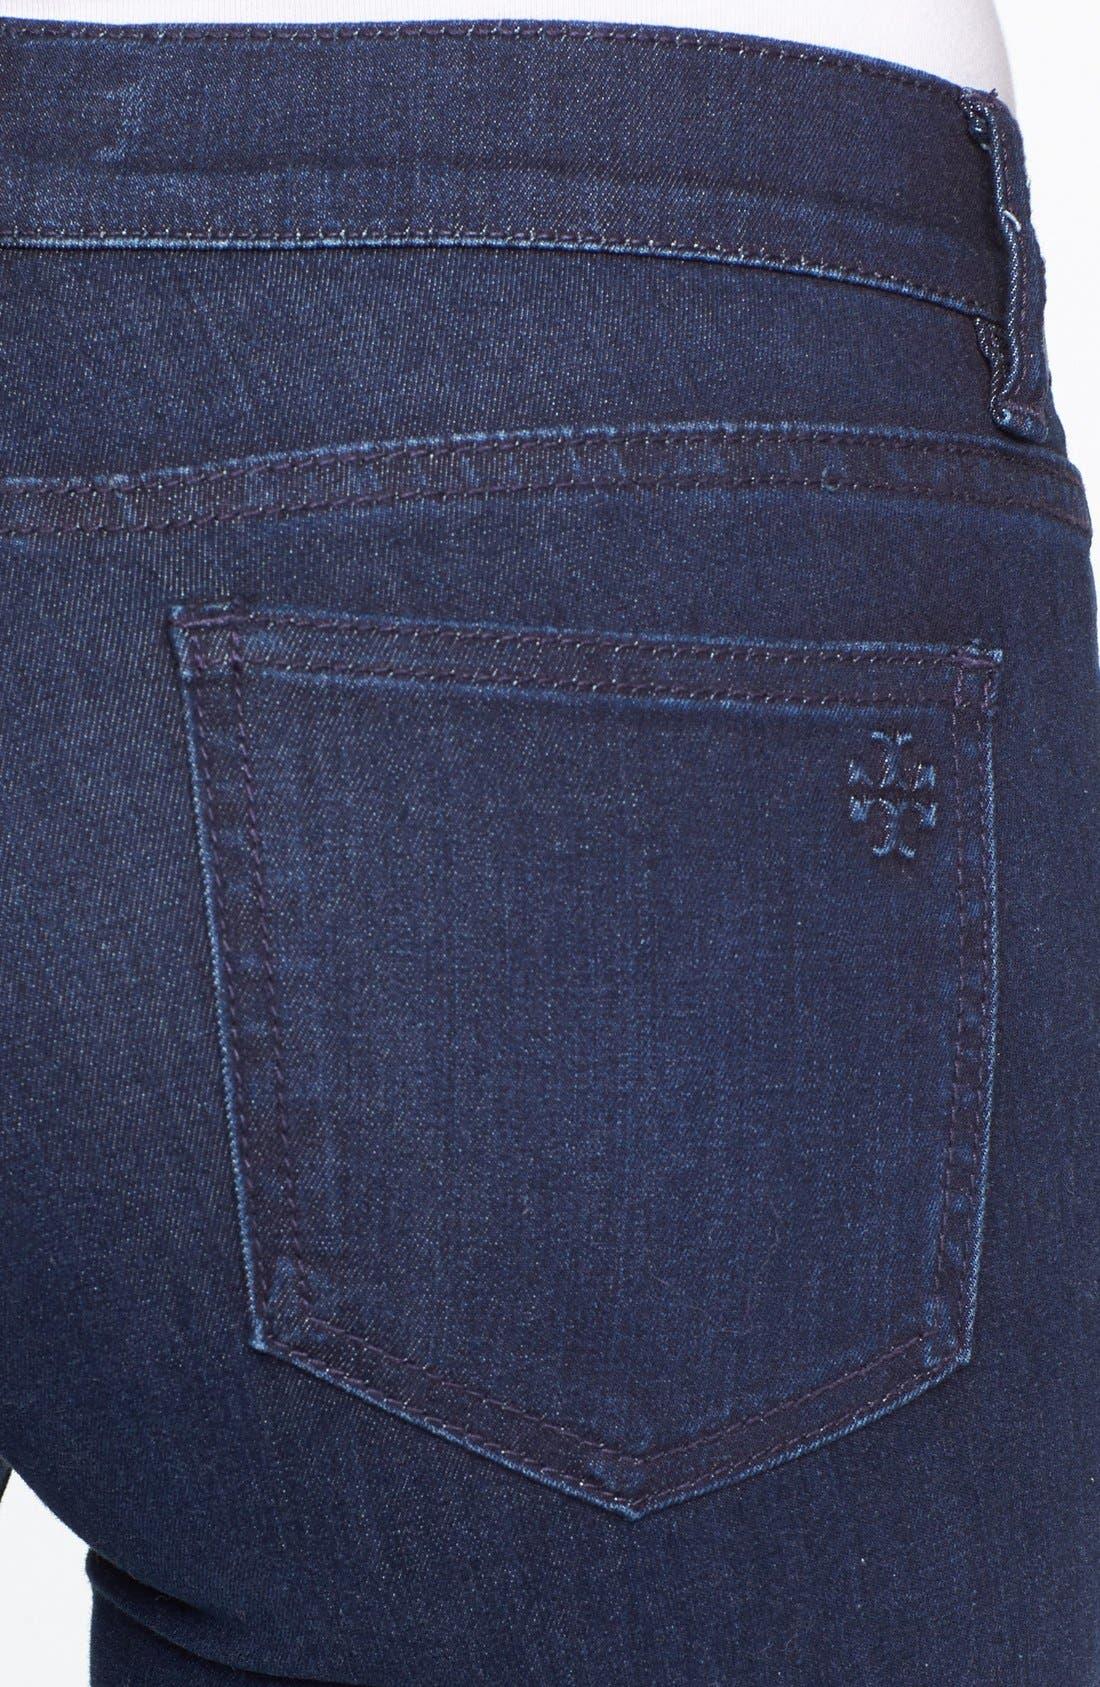 Alternate Image 3  - Tory Burch Stretch Skinny Jeans (Rinse)